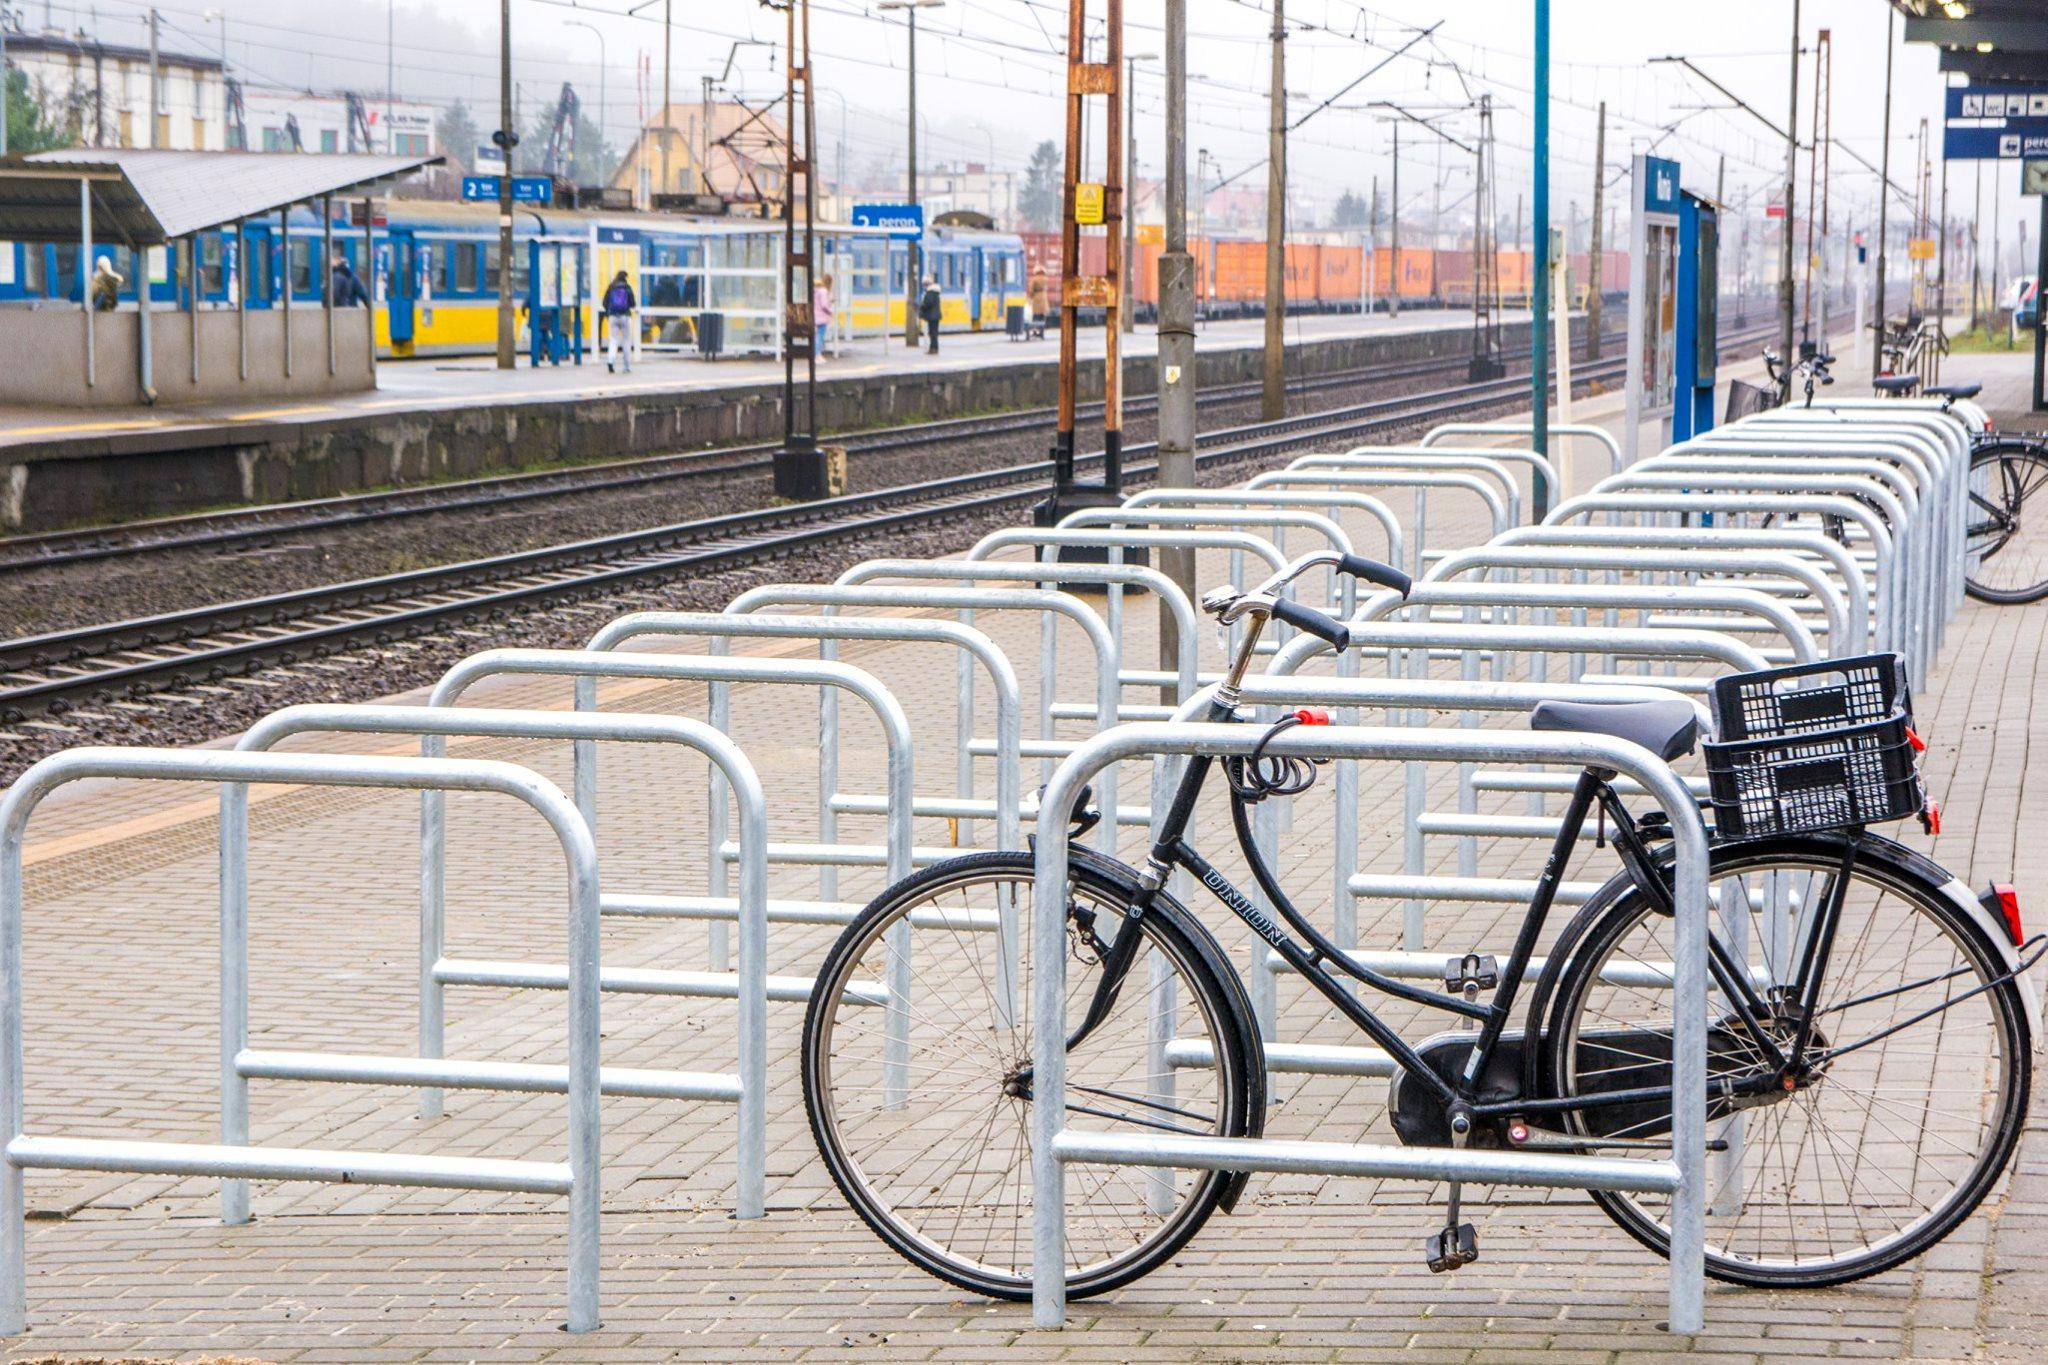 rumia nowe stojaki rowerowe